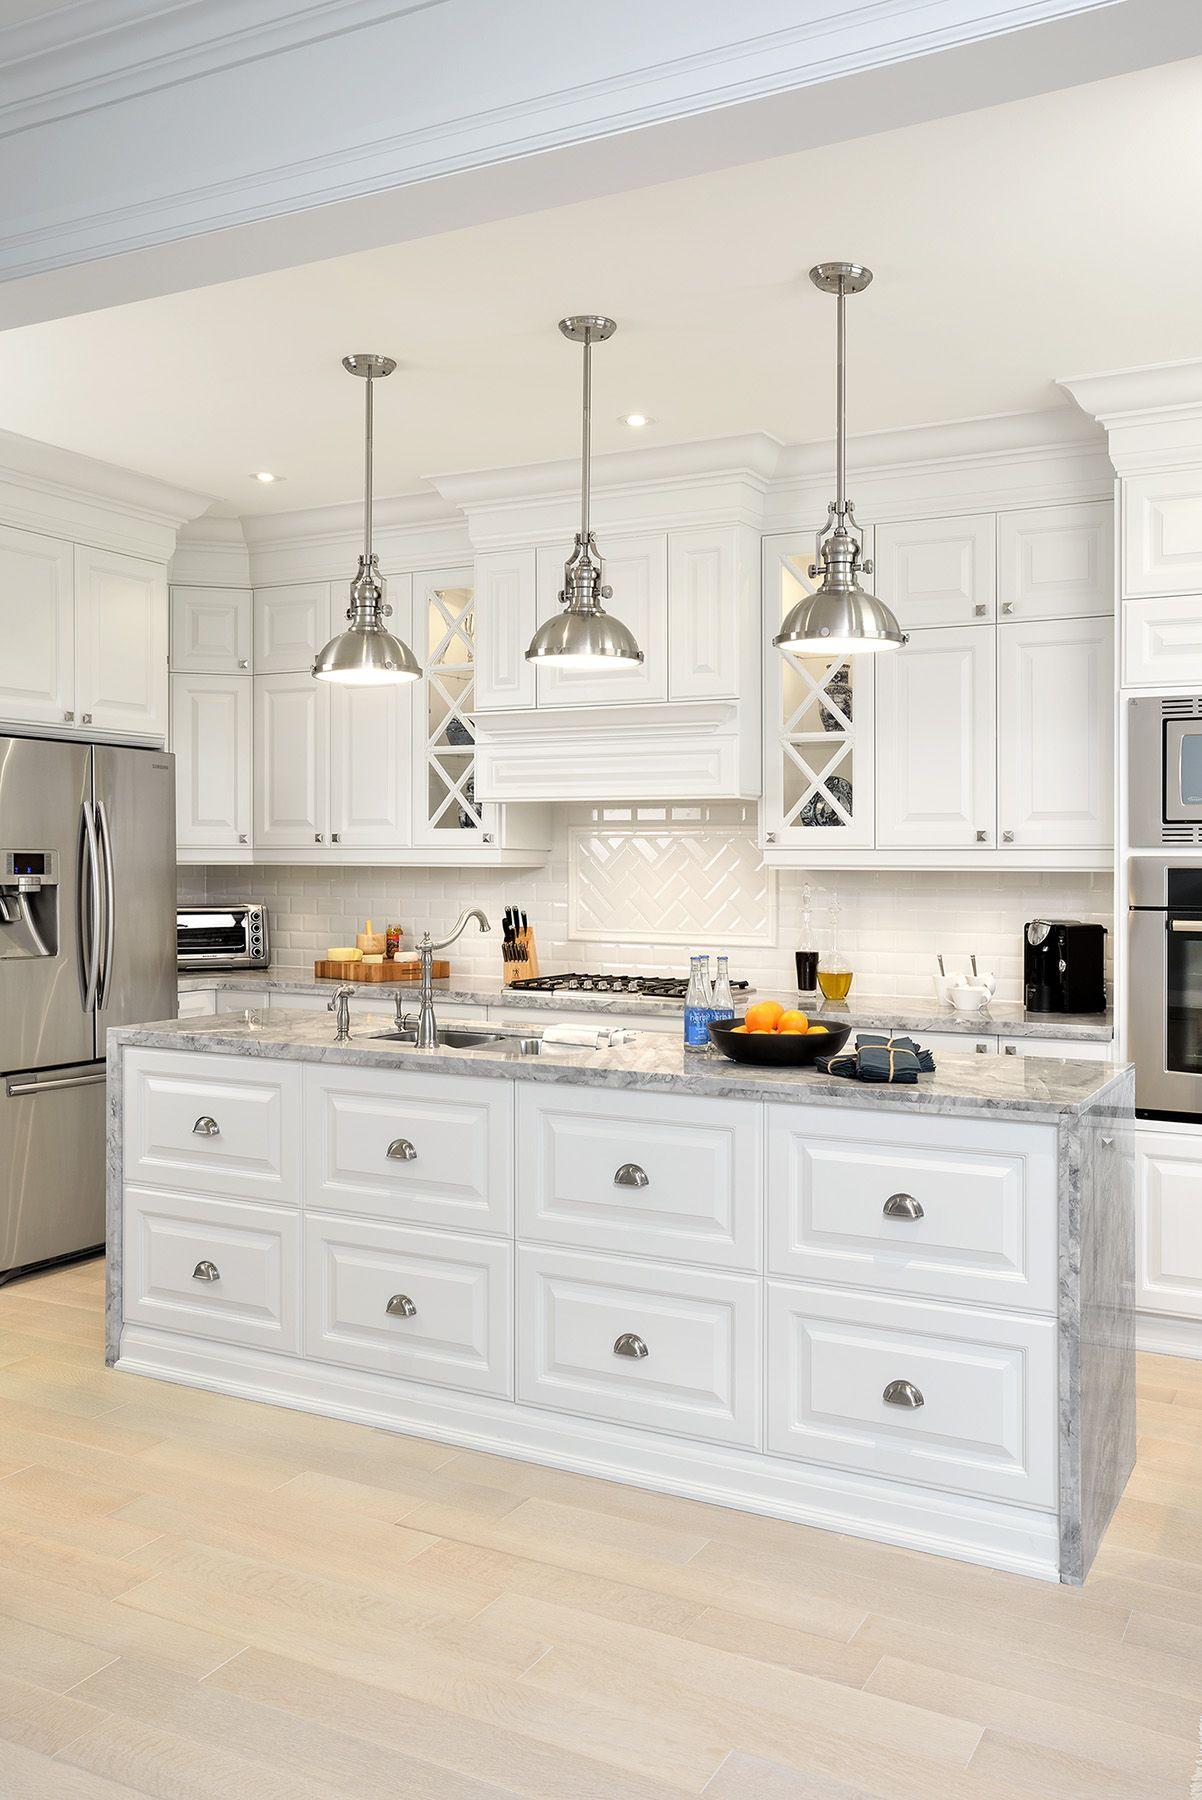 Erica Gelman Design Inc.  #Bentoak   www.ericagelman.com   kitchens ...